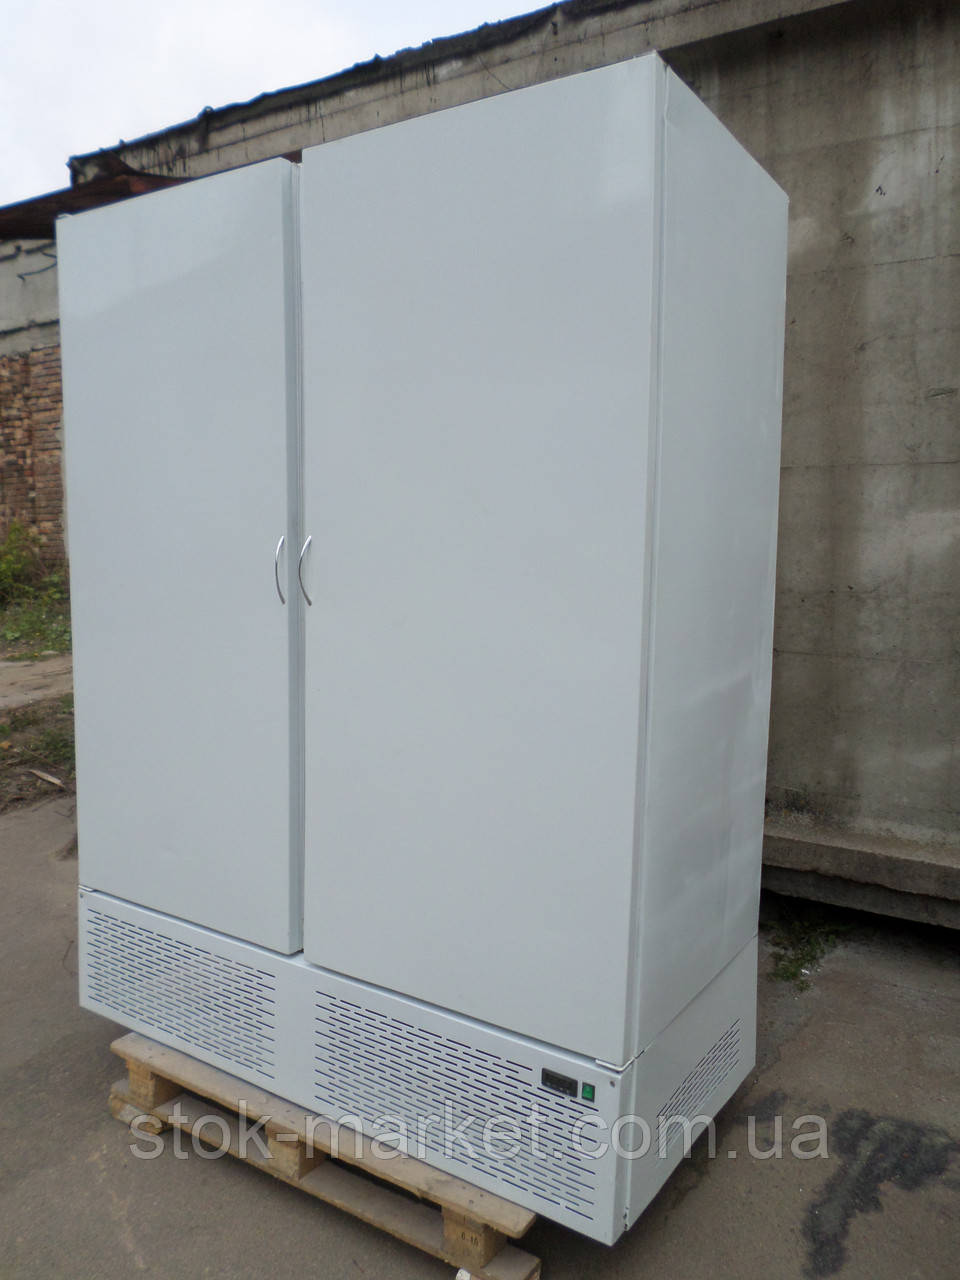 Шафа холодильна дводверний бо, холодильна шафа глухий б/у